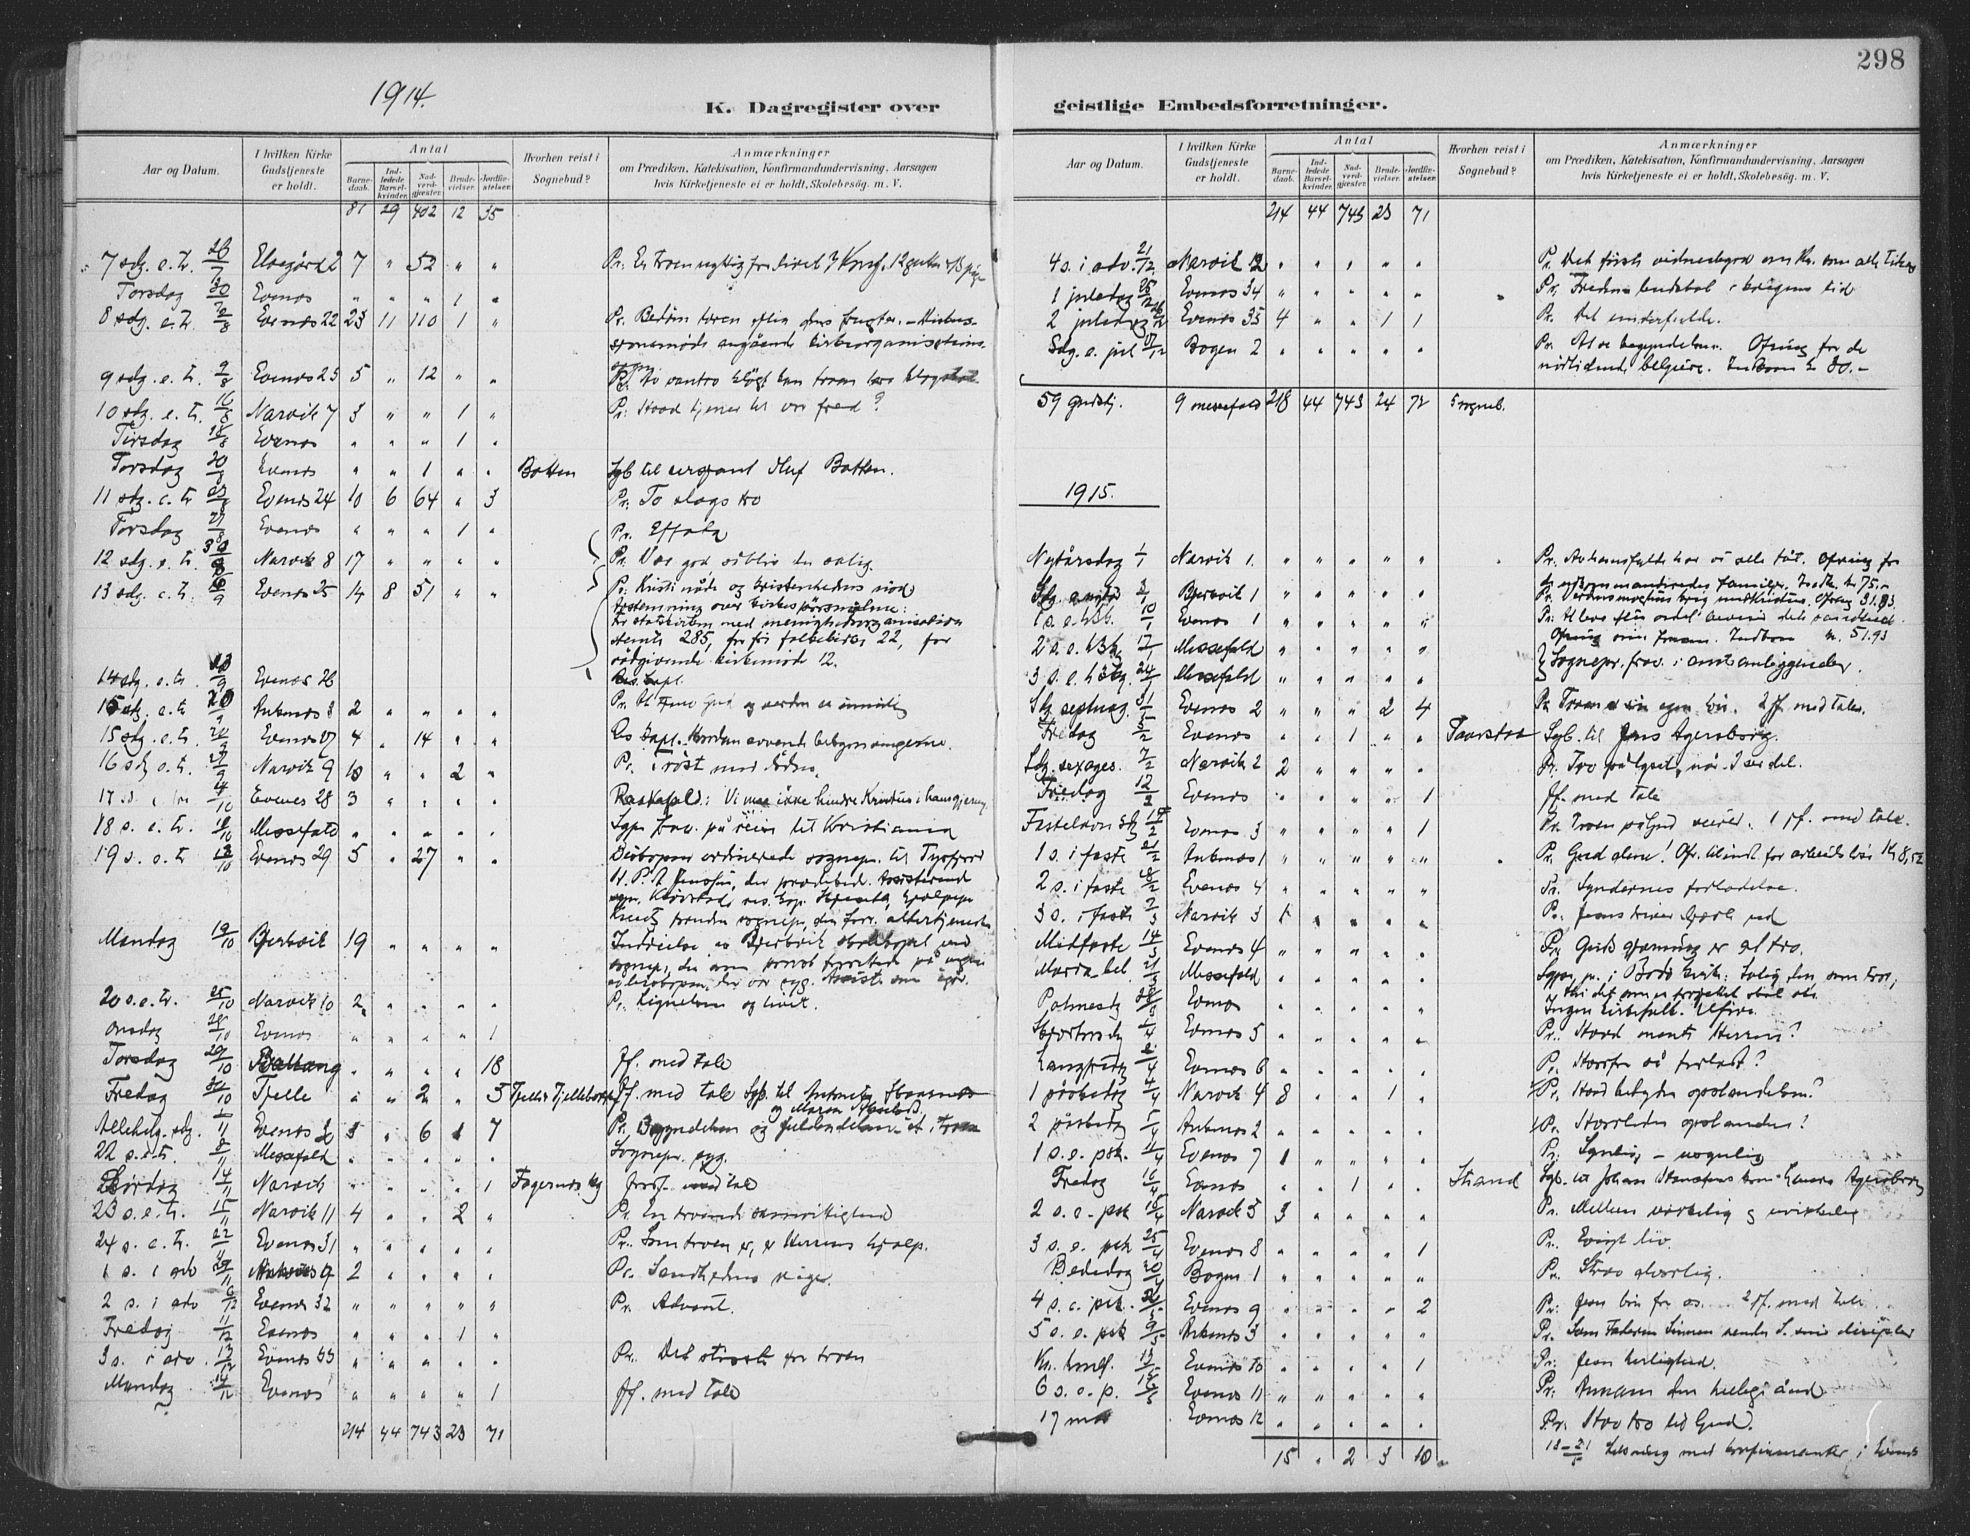 SAT, Ministerialprotokoller, klokkerbøker og fødselsregistre - Nordland, 863/L0899: Ministerialbok nr. 863A11, 1897-1906, s. 298